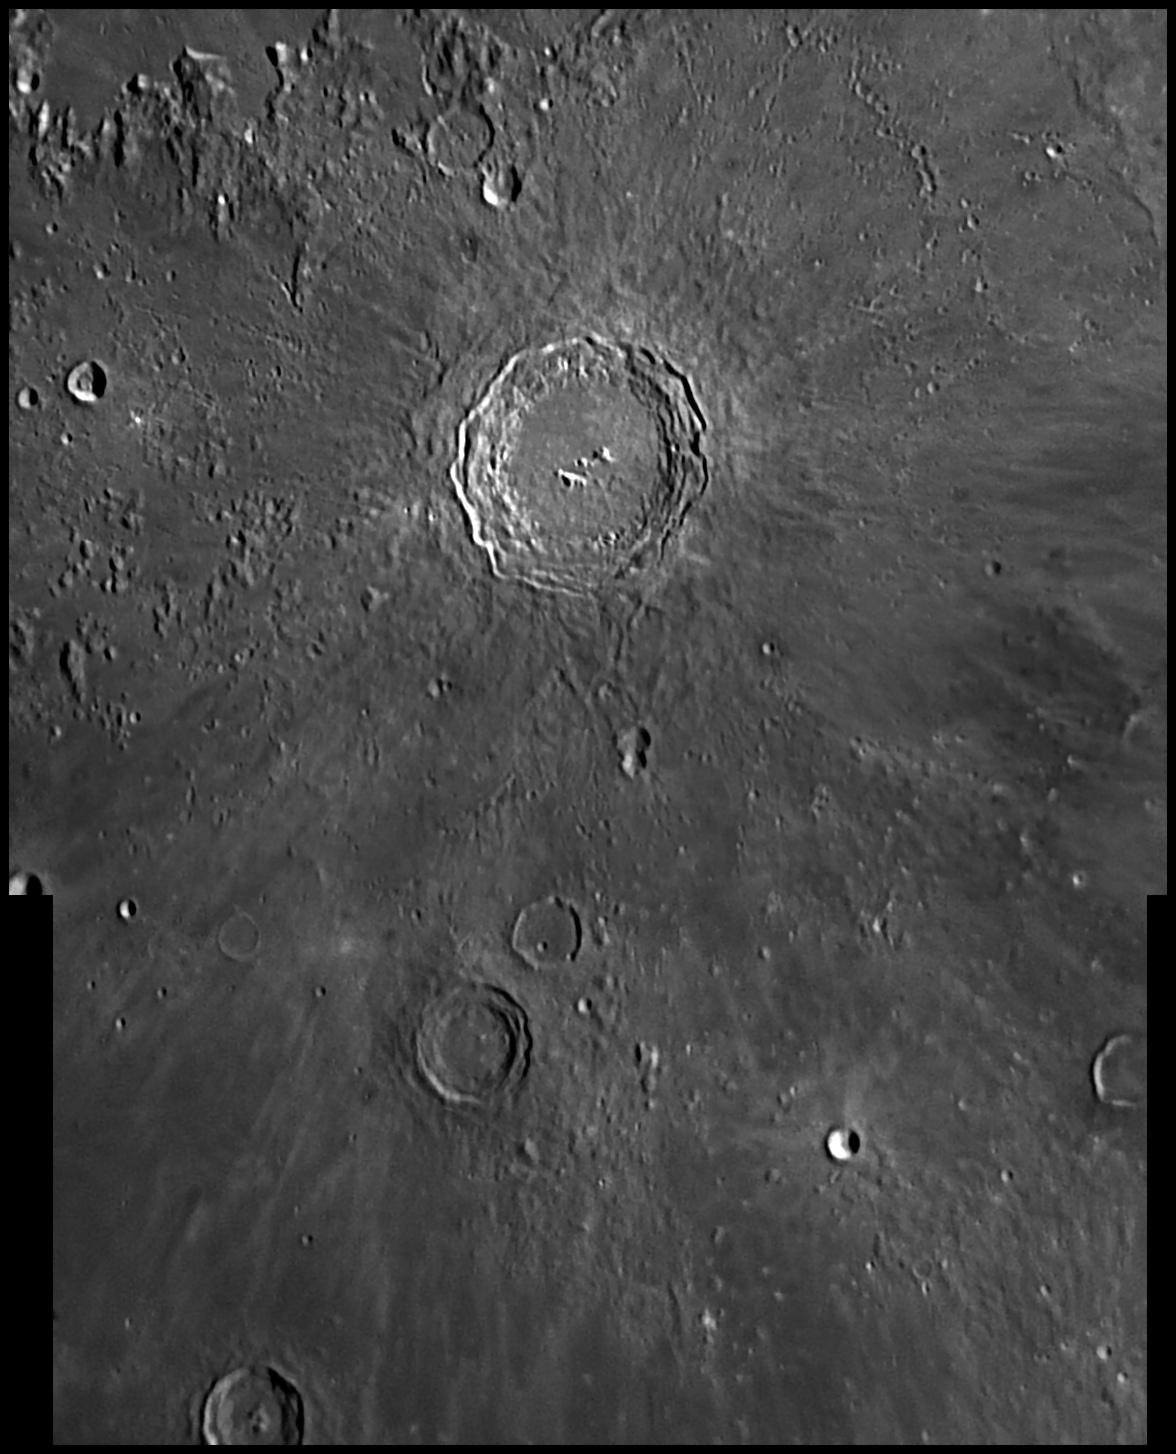 lune_2020_04_04_212756_212911.jpg.d364ae108720d75f5d317065b426d0c4.jpg